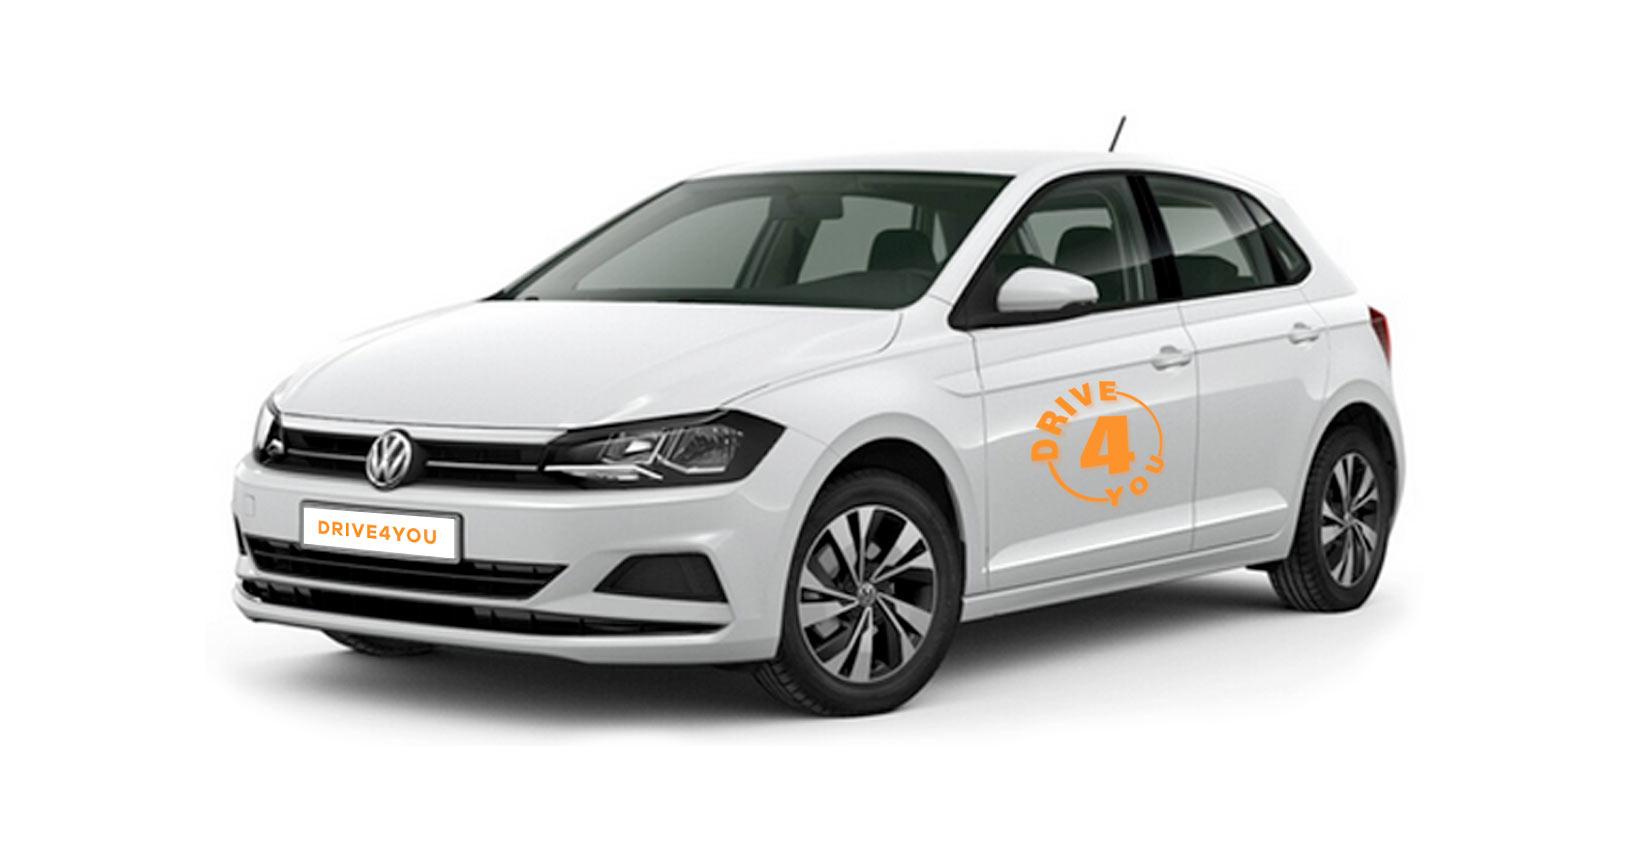 VW-Polo-d4y